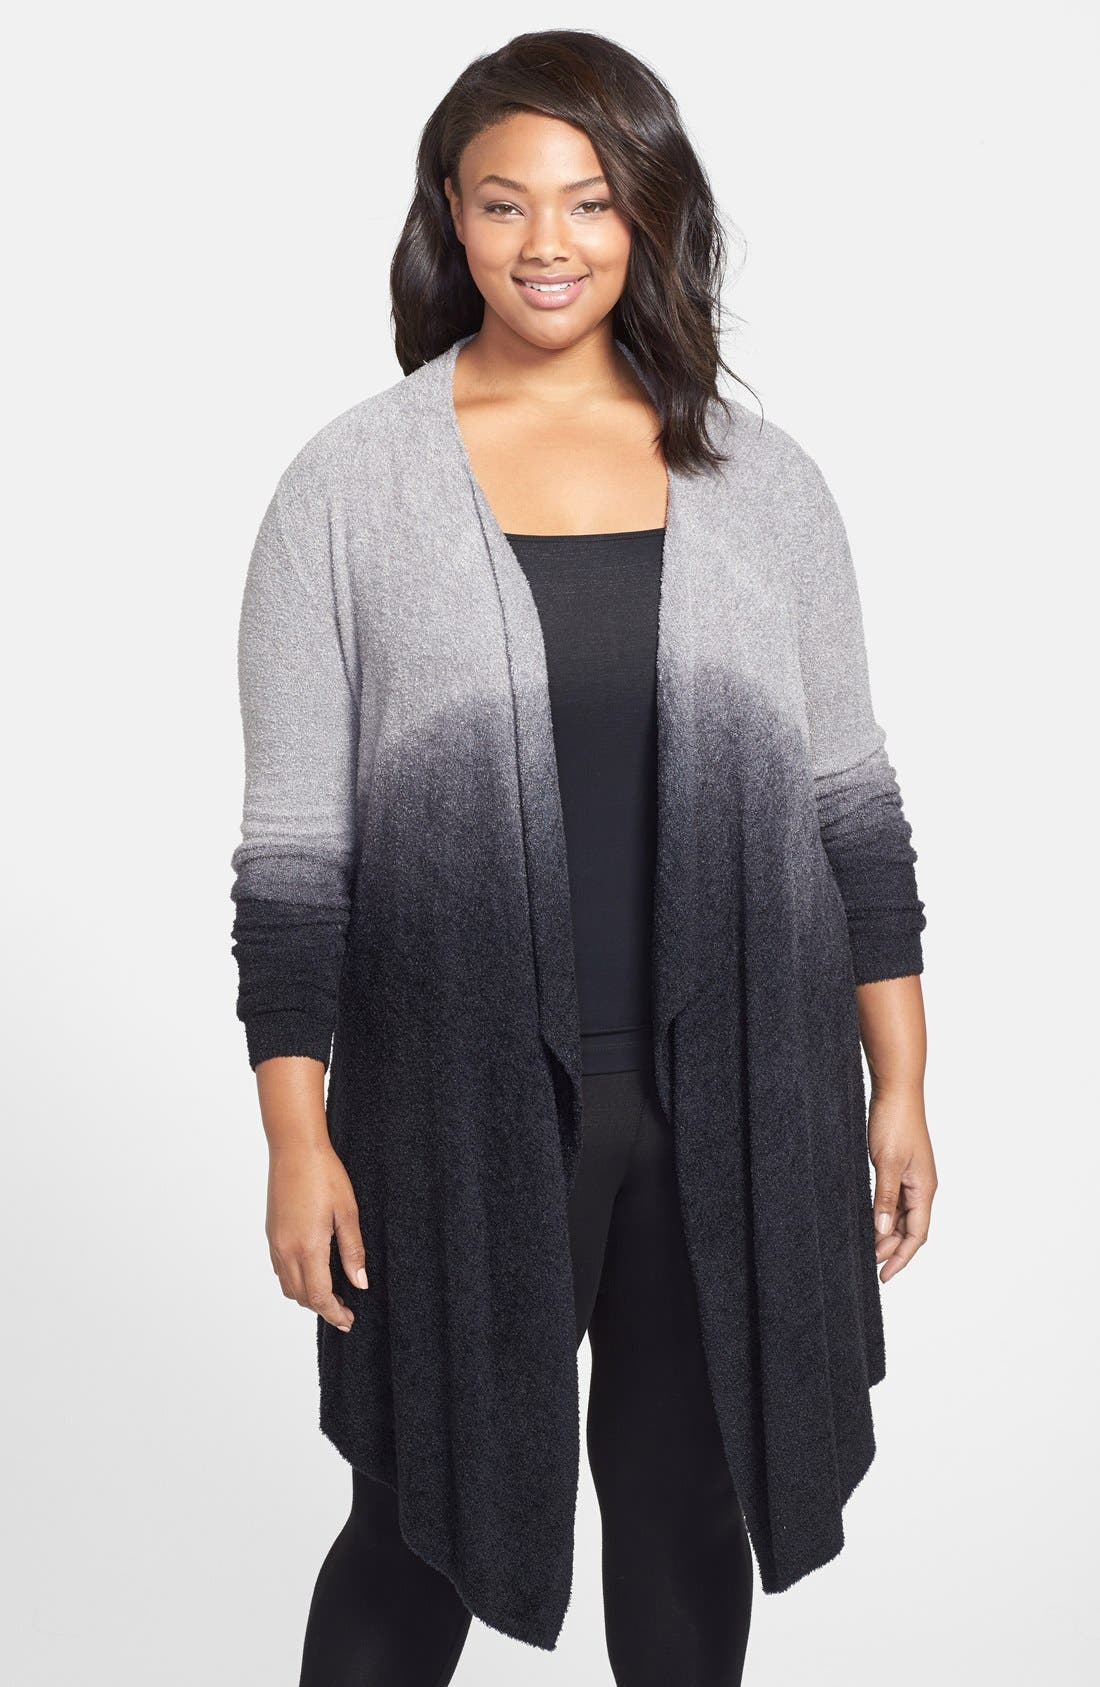 Alternate Image 1 Selected - Barefoot Dreams® CozyChic Lite® Calypso Wrap Cardigan (Plus Size) (Nordstrom Exclusive)